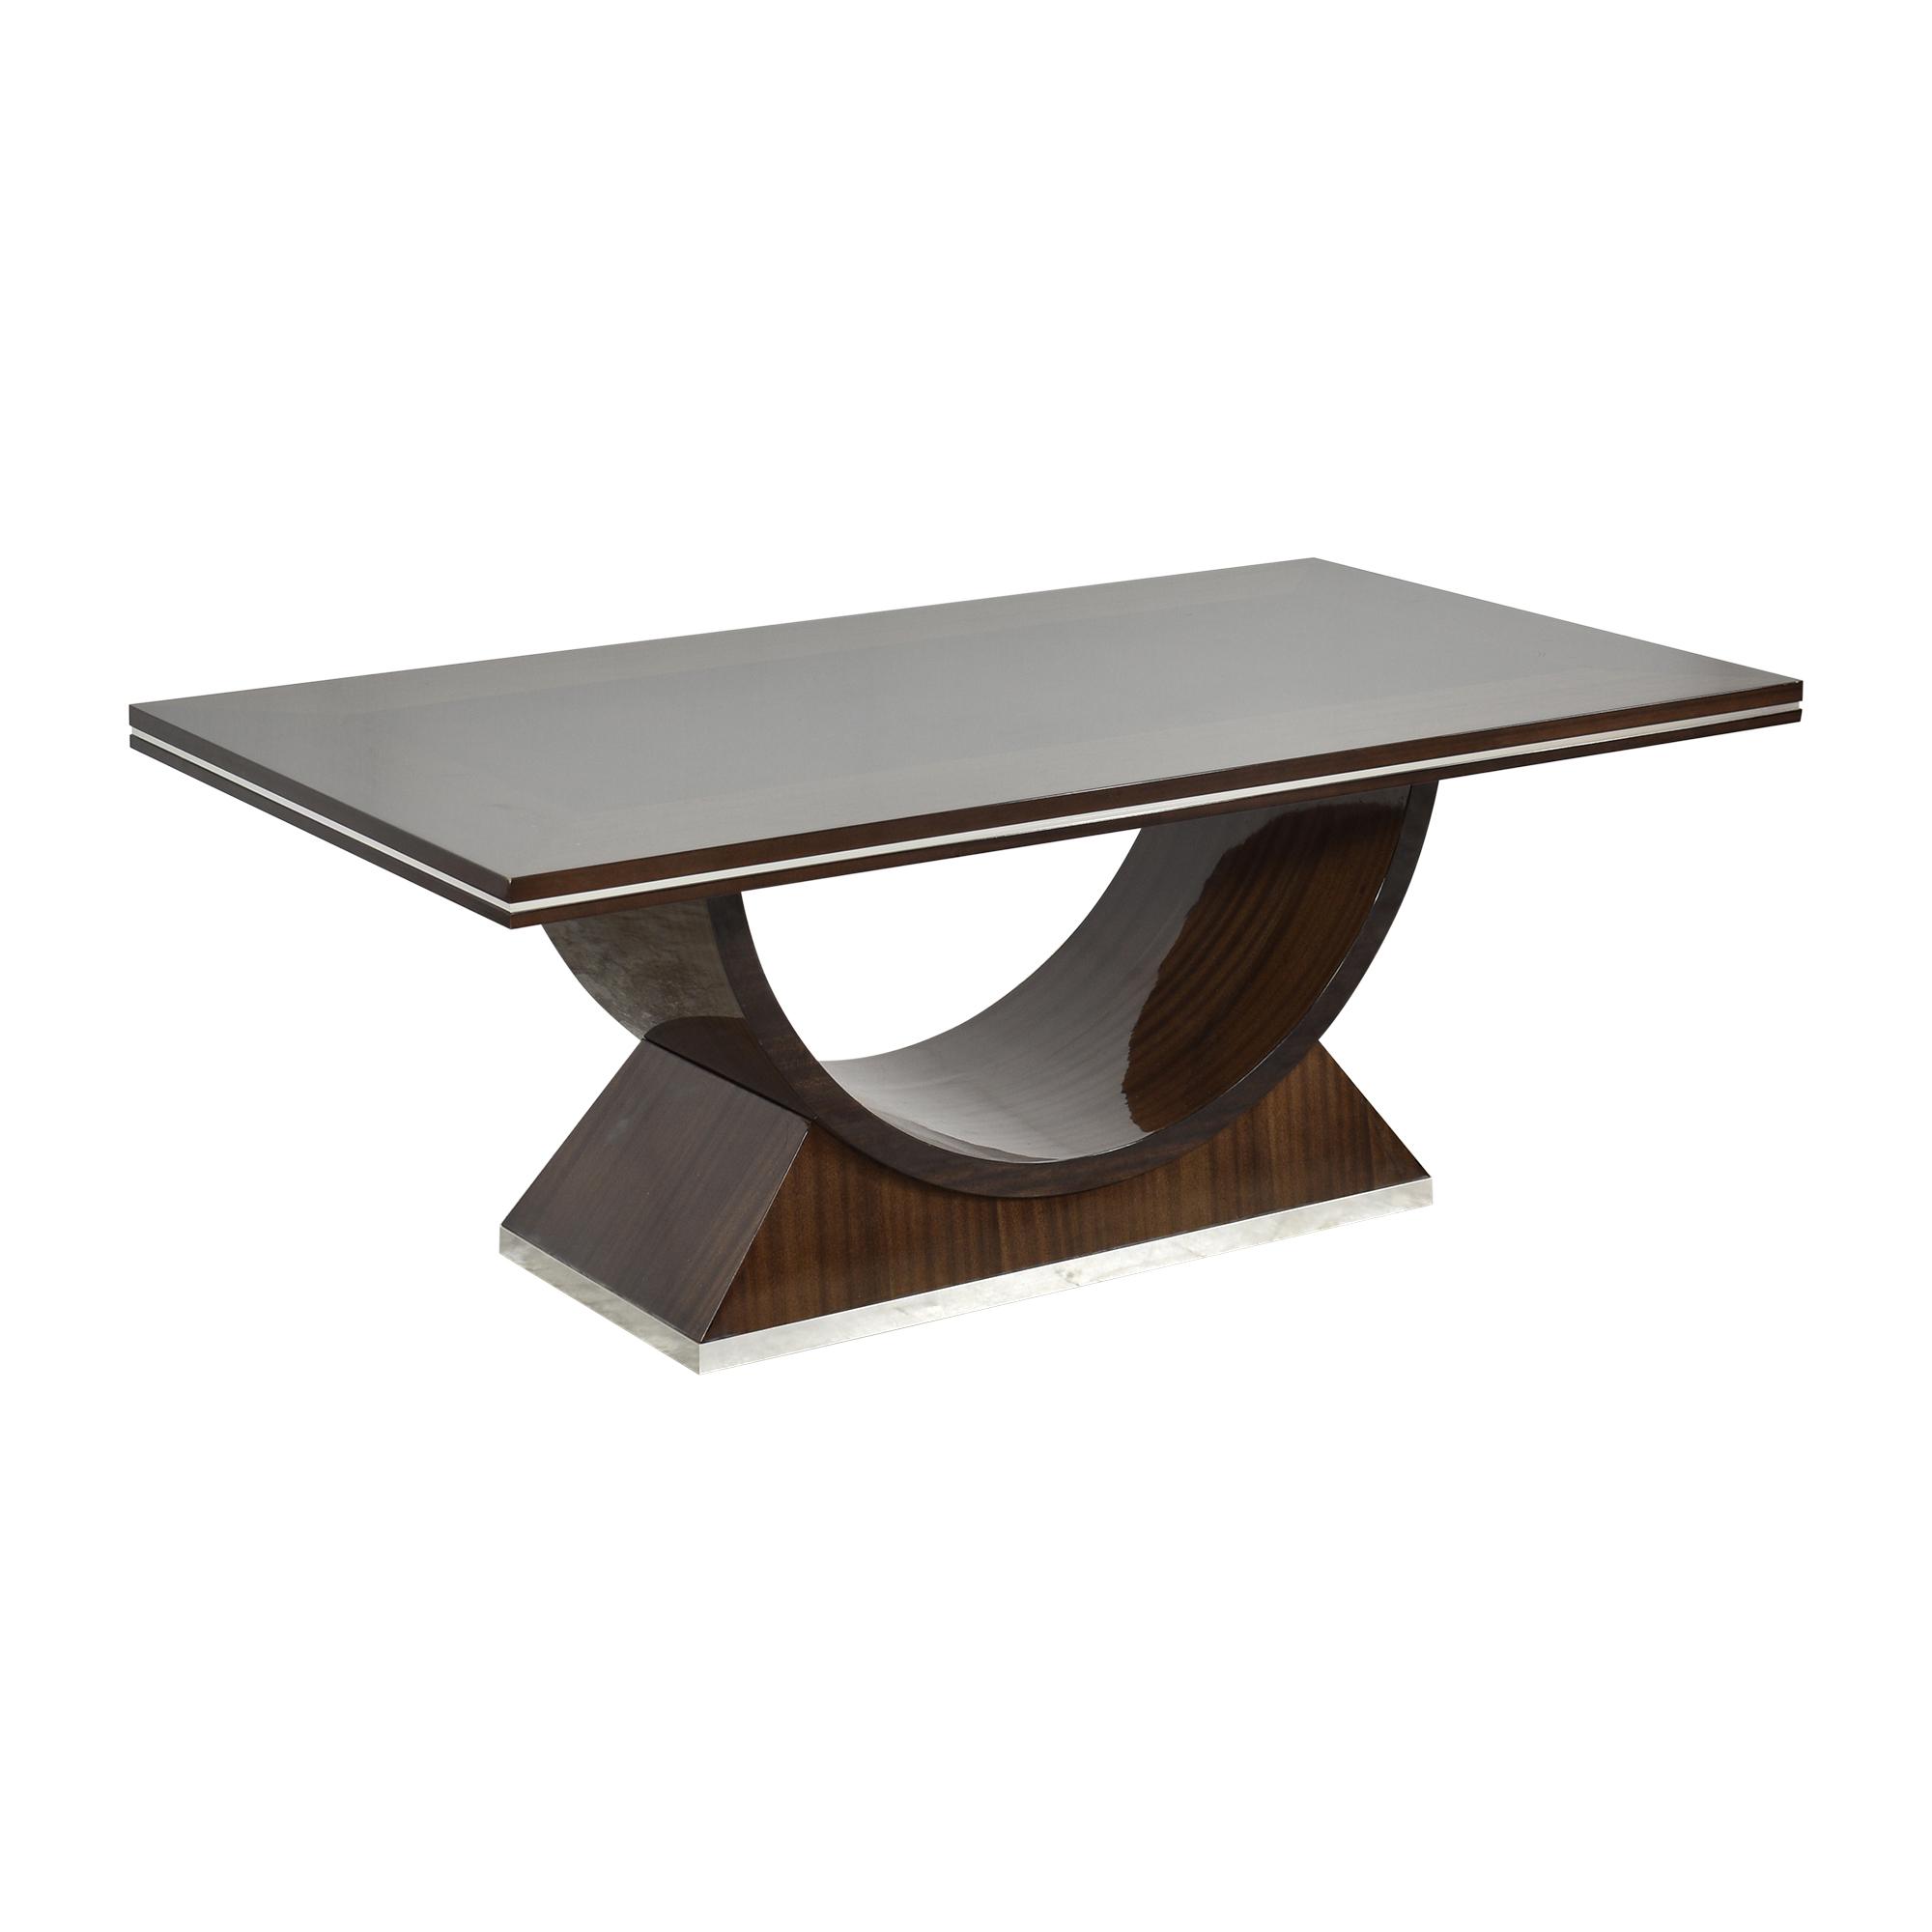 Pietro Costantini Pietro Costantini Contemporary Extendable Dining Table dimensions